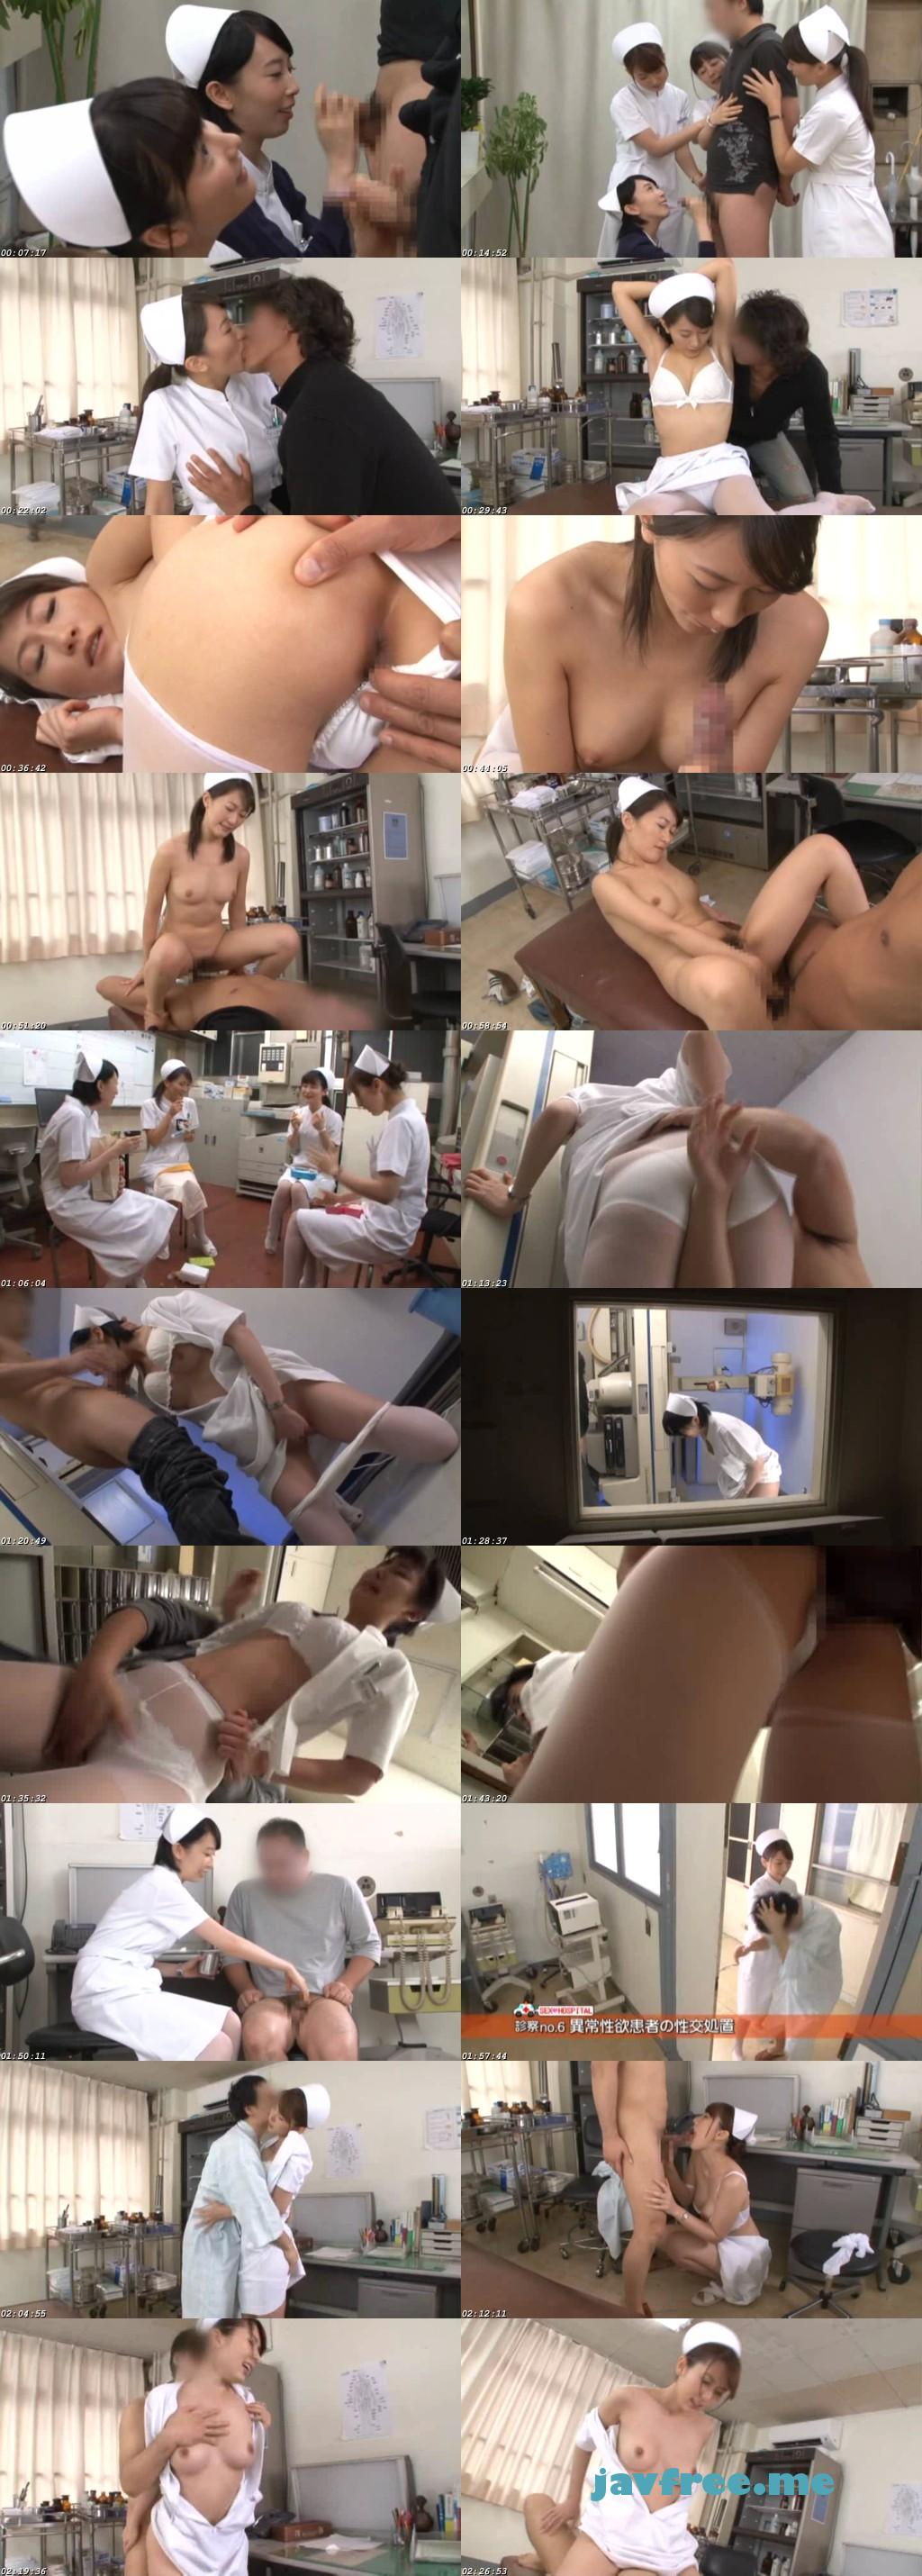 [SDDE-306] 性欲処理専門 セックス外来医院 5 - image  on https://javfree.me